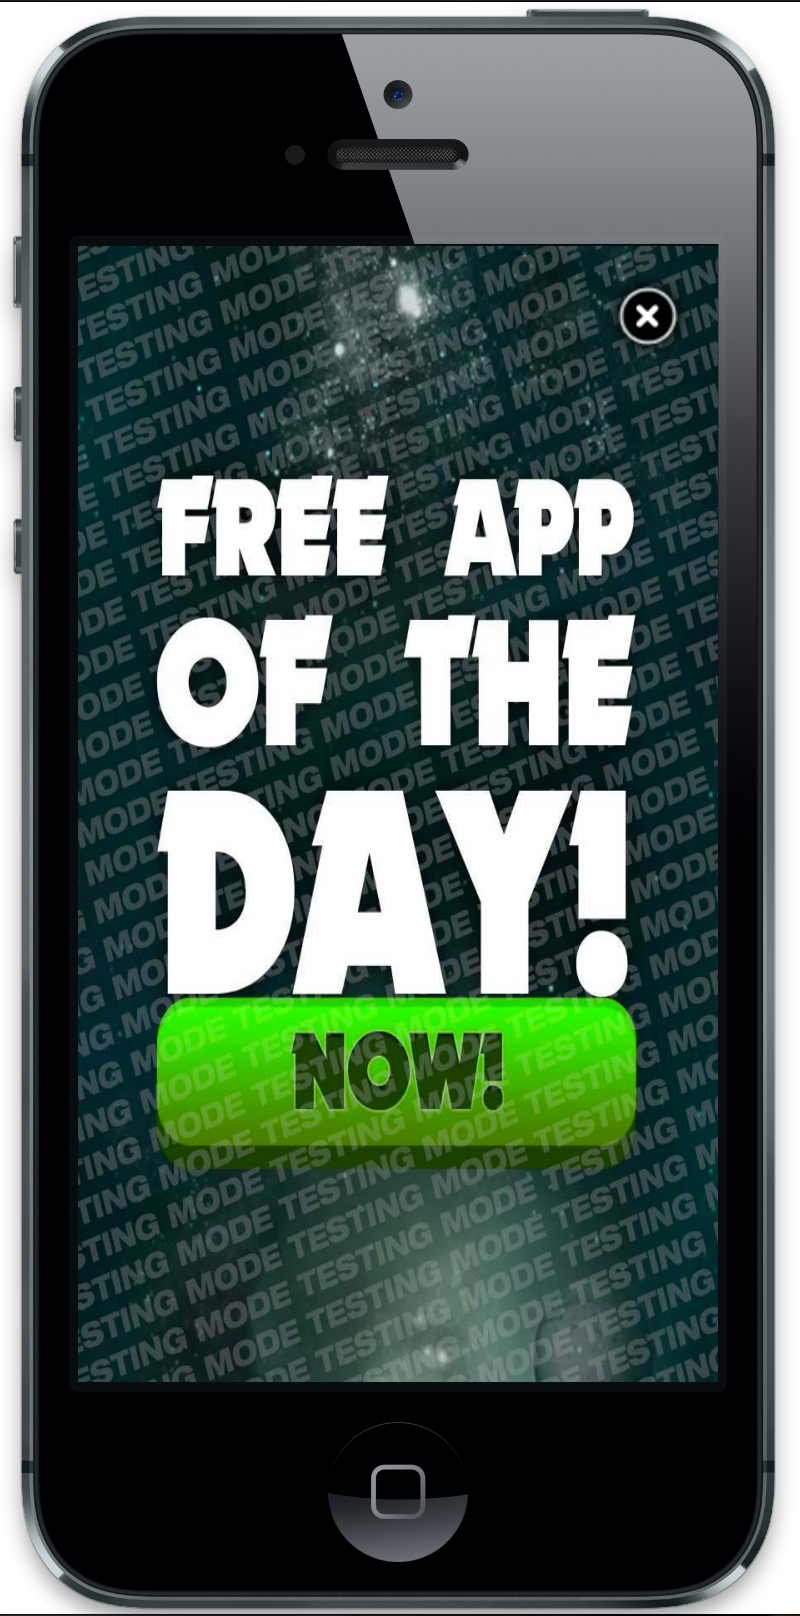 Match App - iPhone & iPad iOS + AD + Game Center